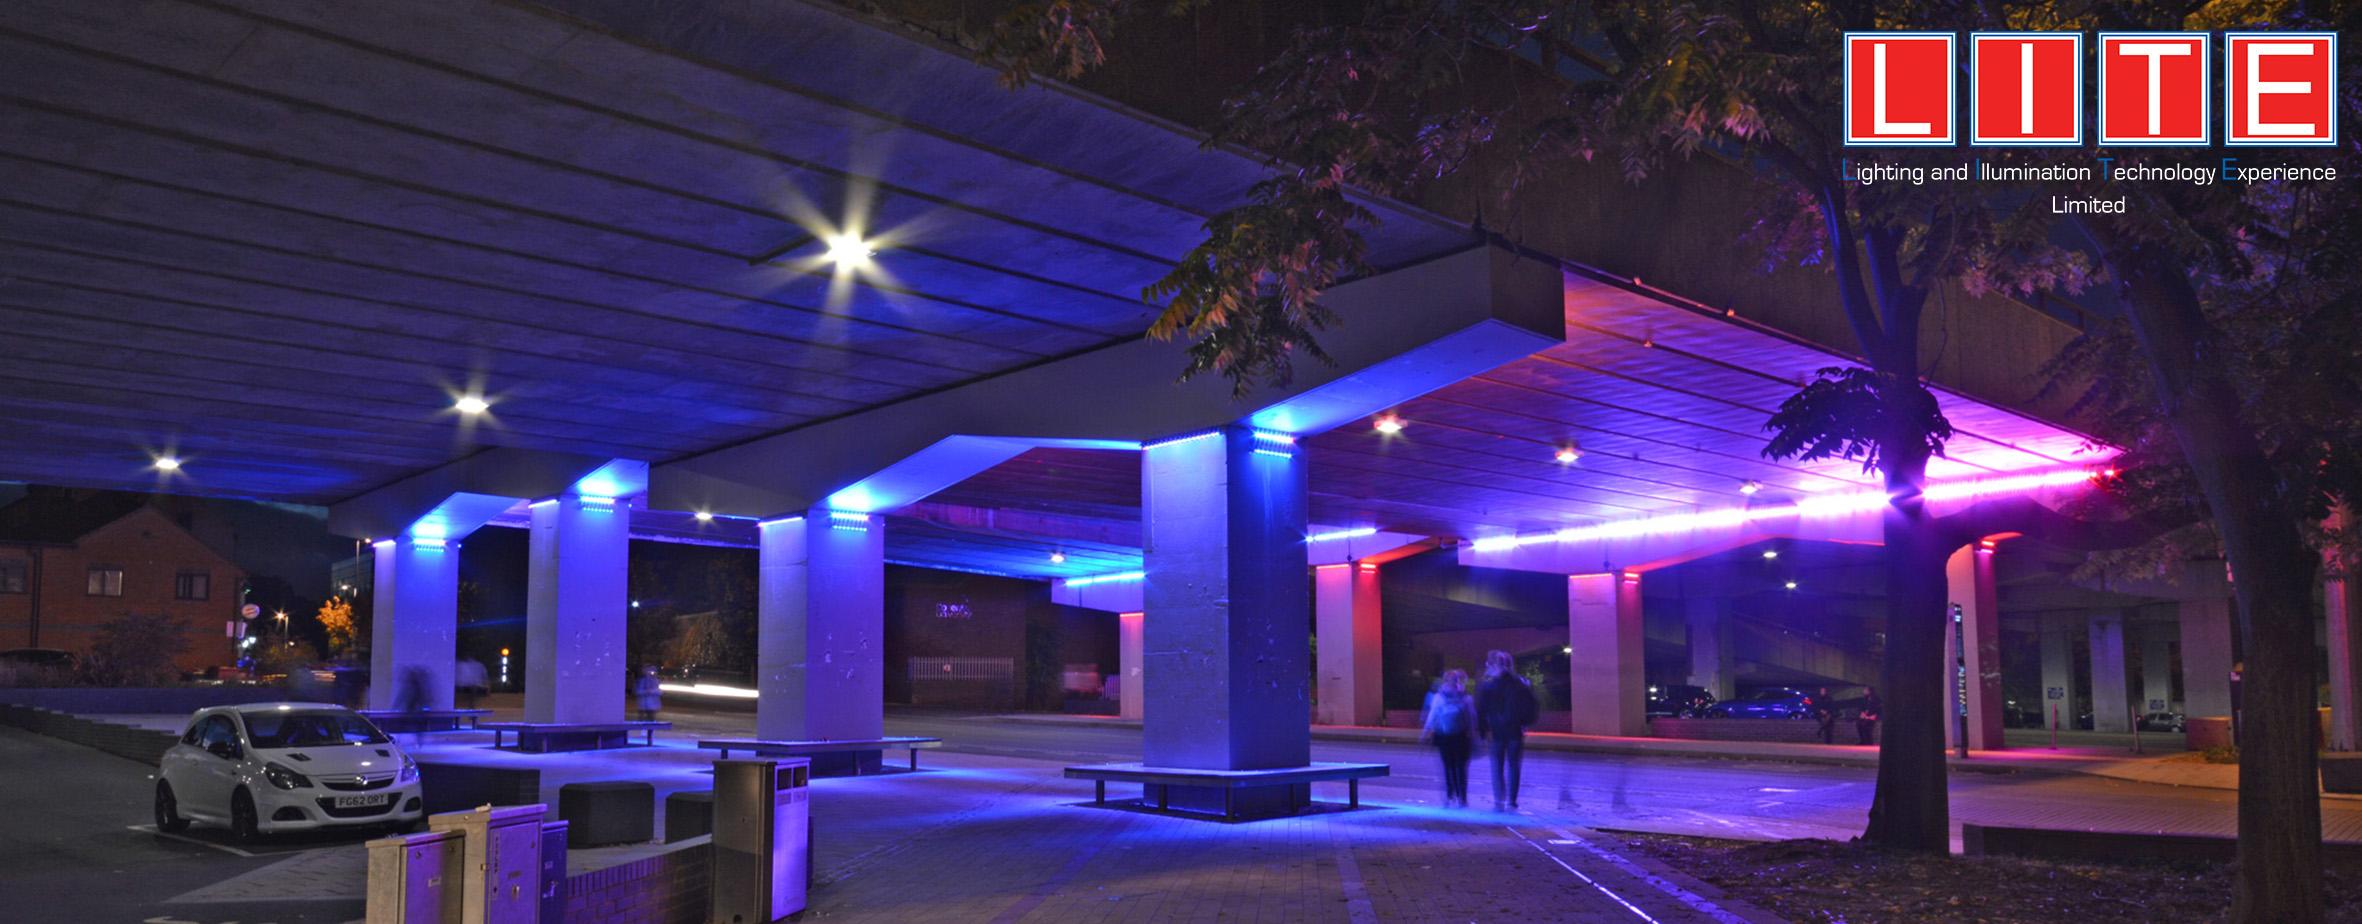 Lite Ltd | Gosford street light/rgb lighting Gosford street